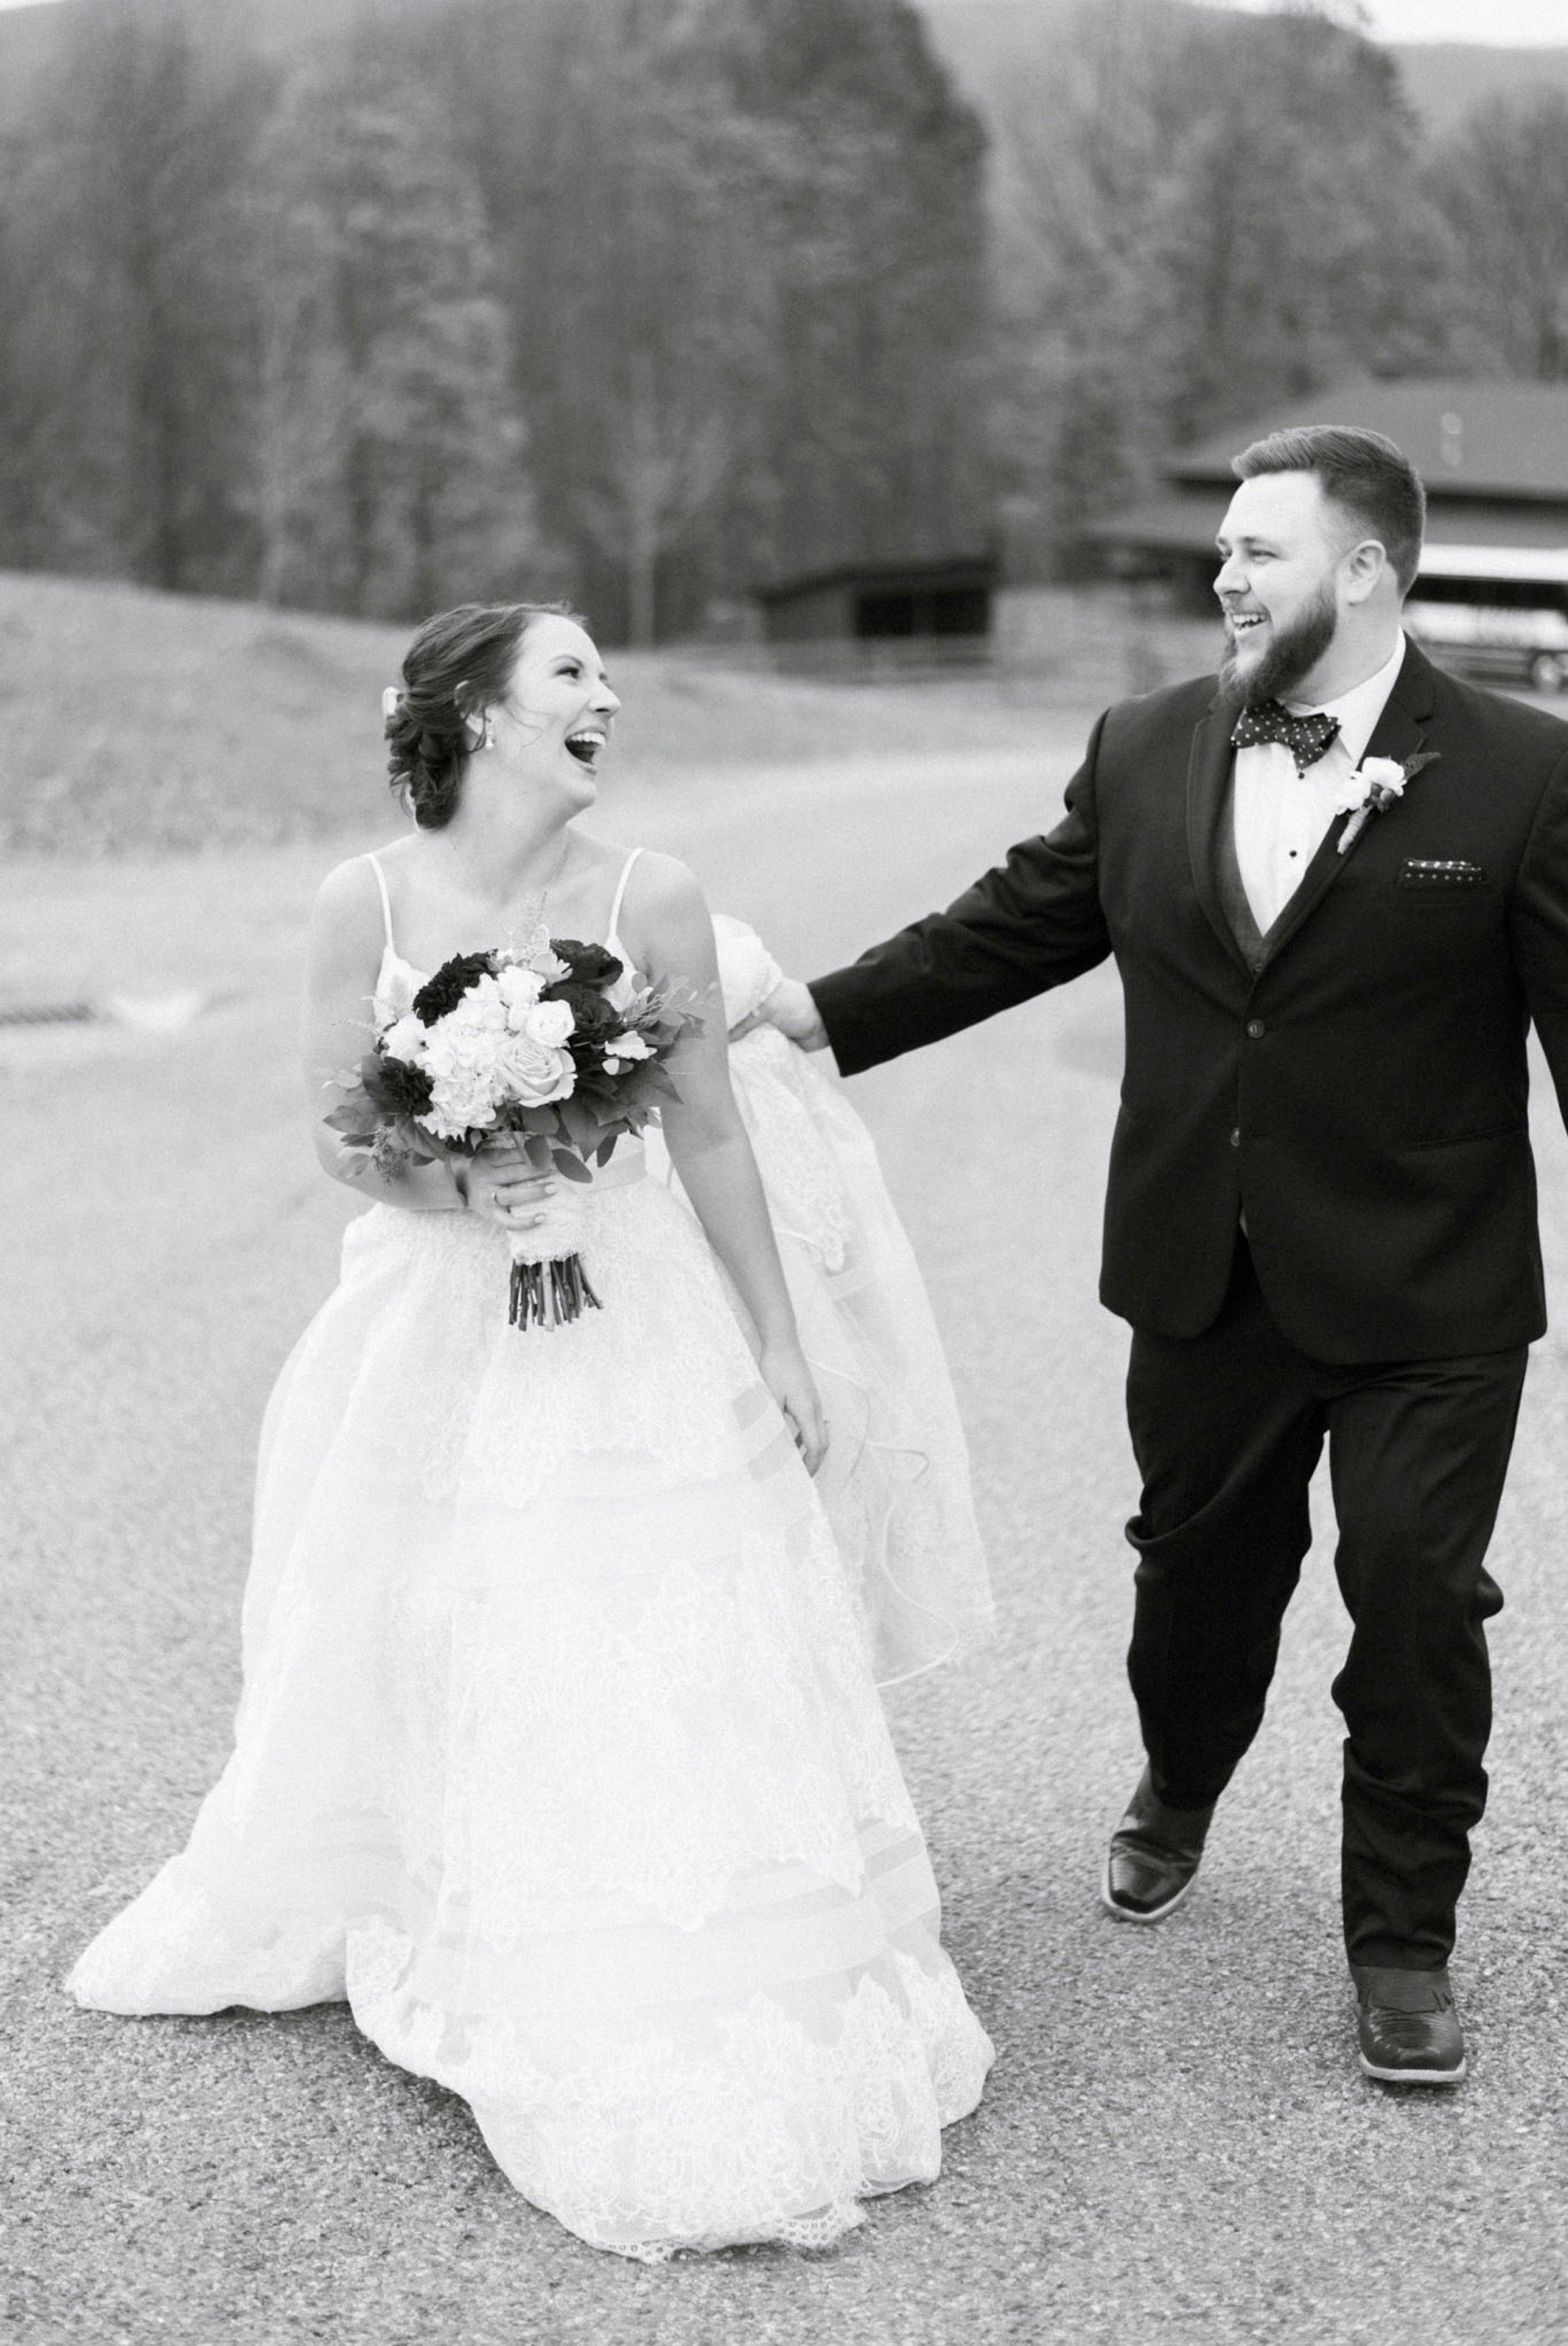 IrvineEstate_LexingtonVA_Wedding_FallWedding_VirginiaWeddingPhotographer 76.jpg